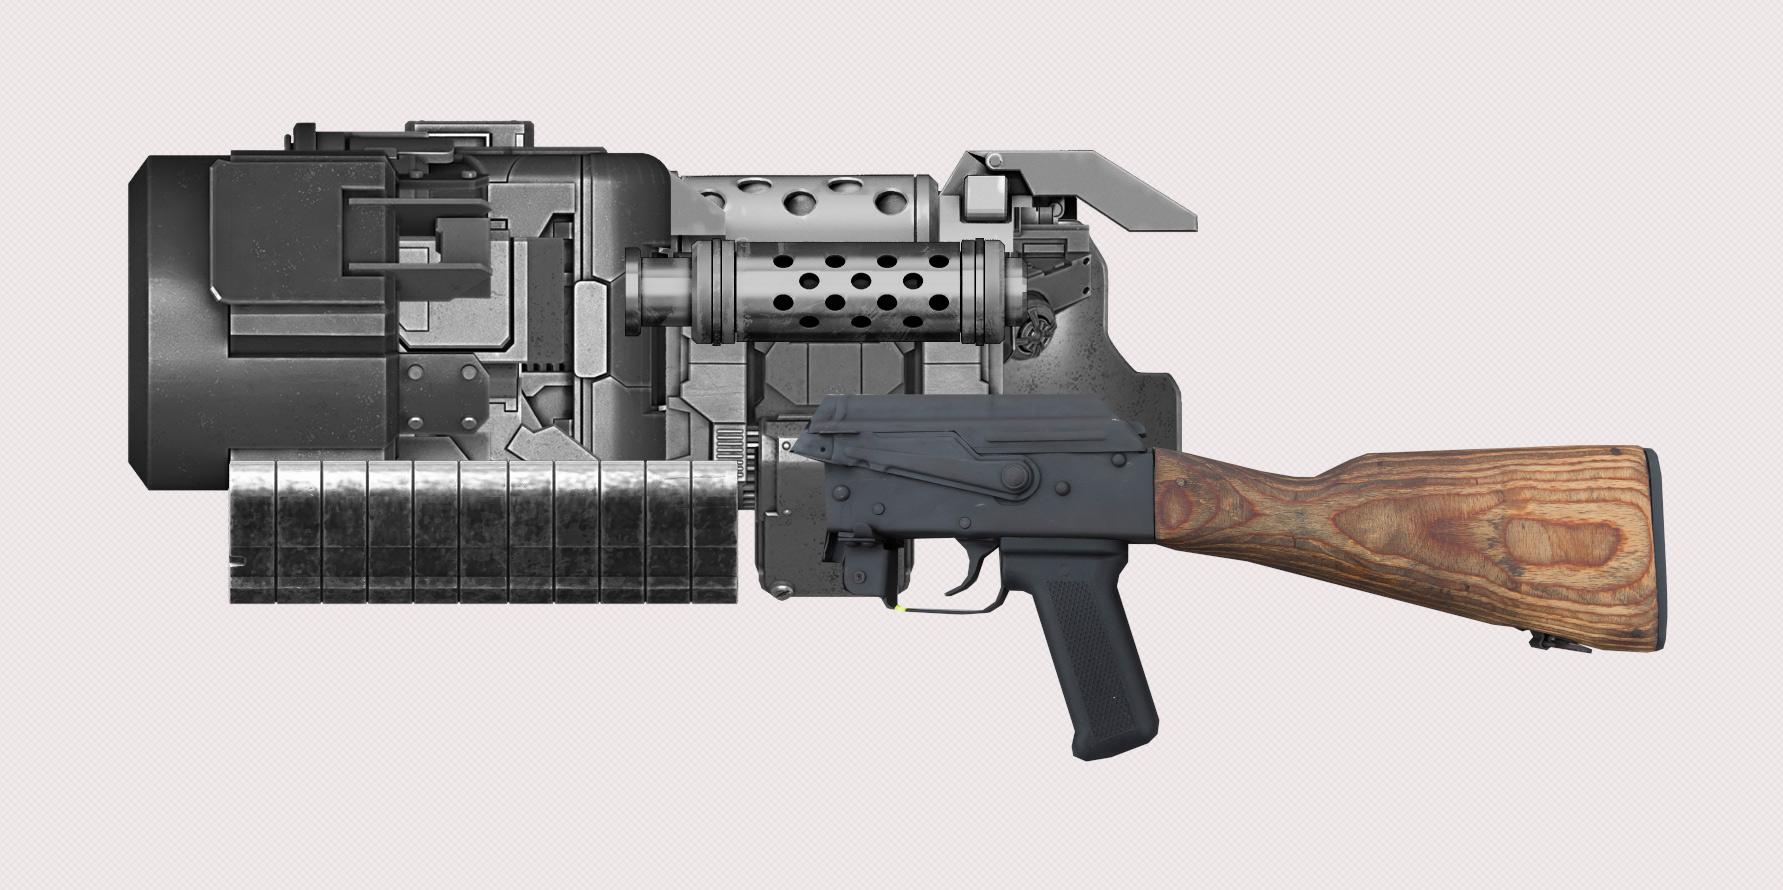 weapon design concept art tutorial